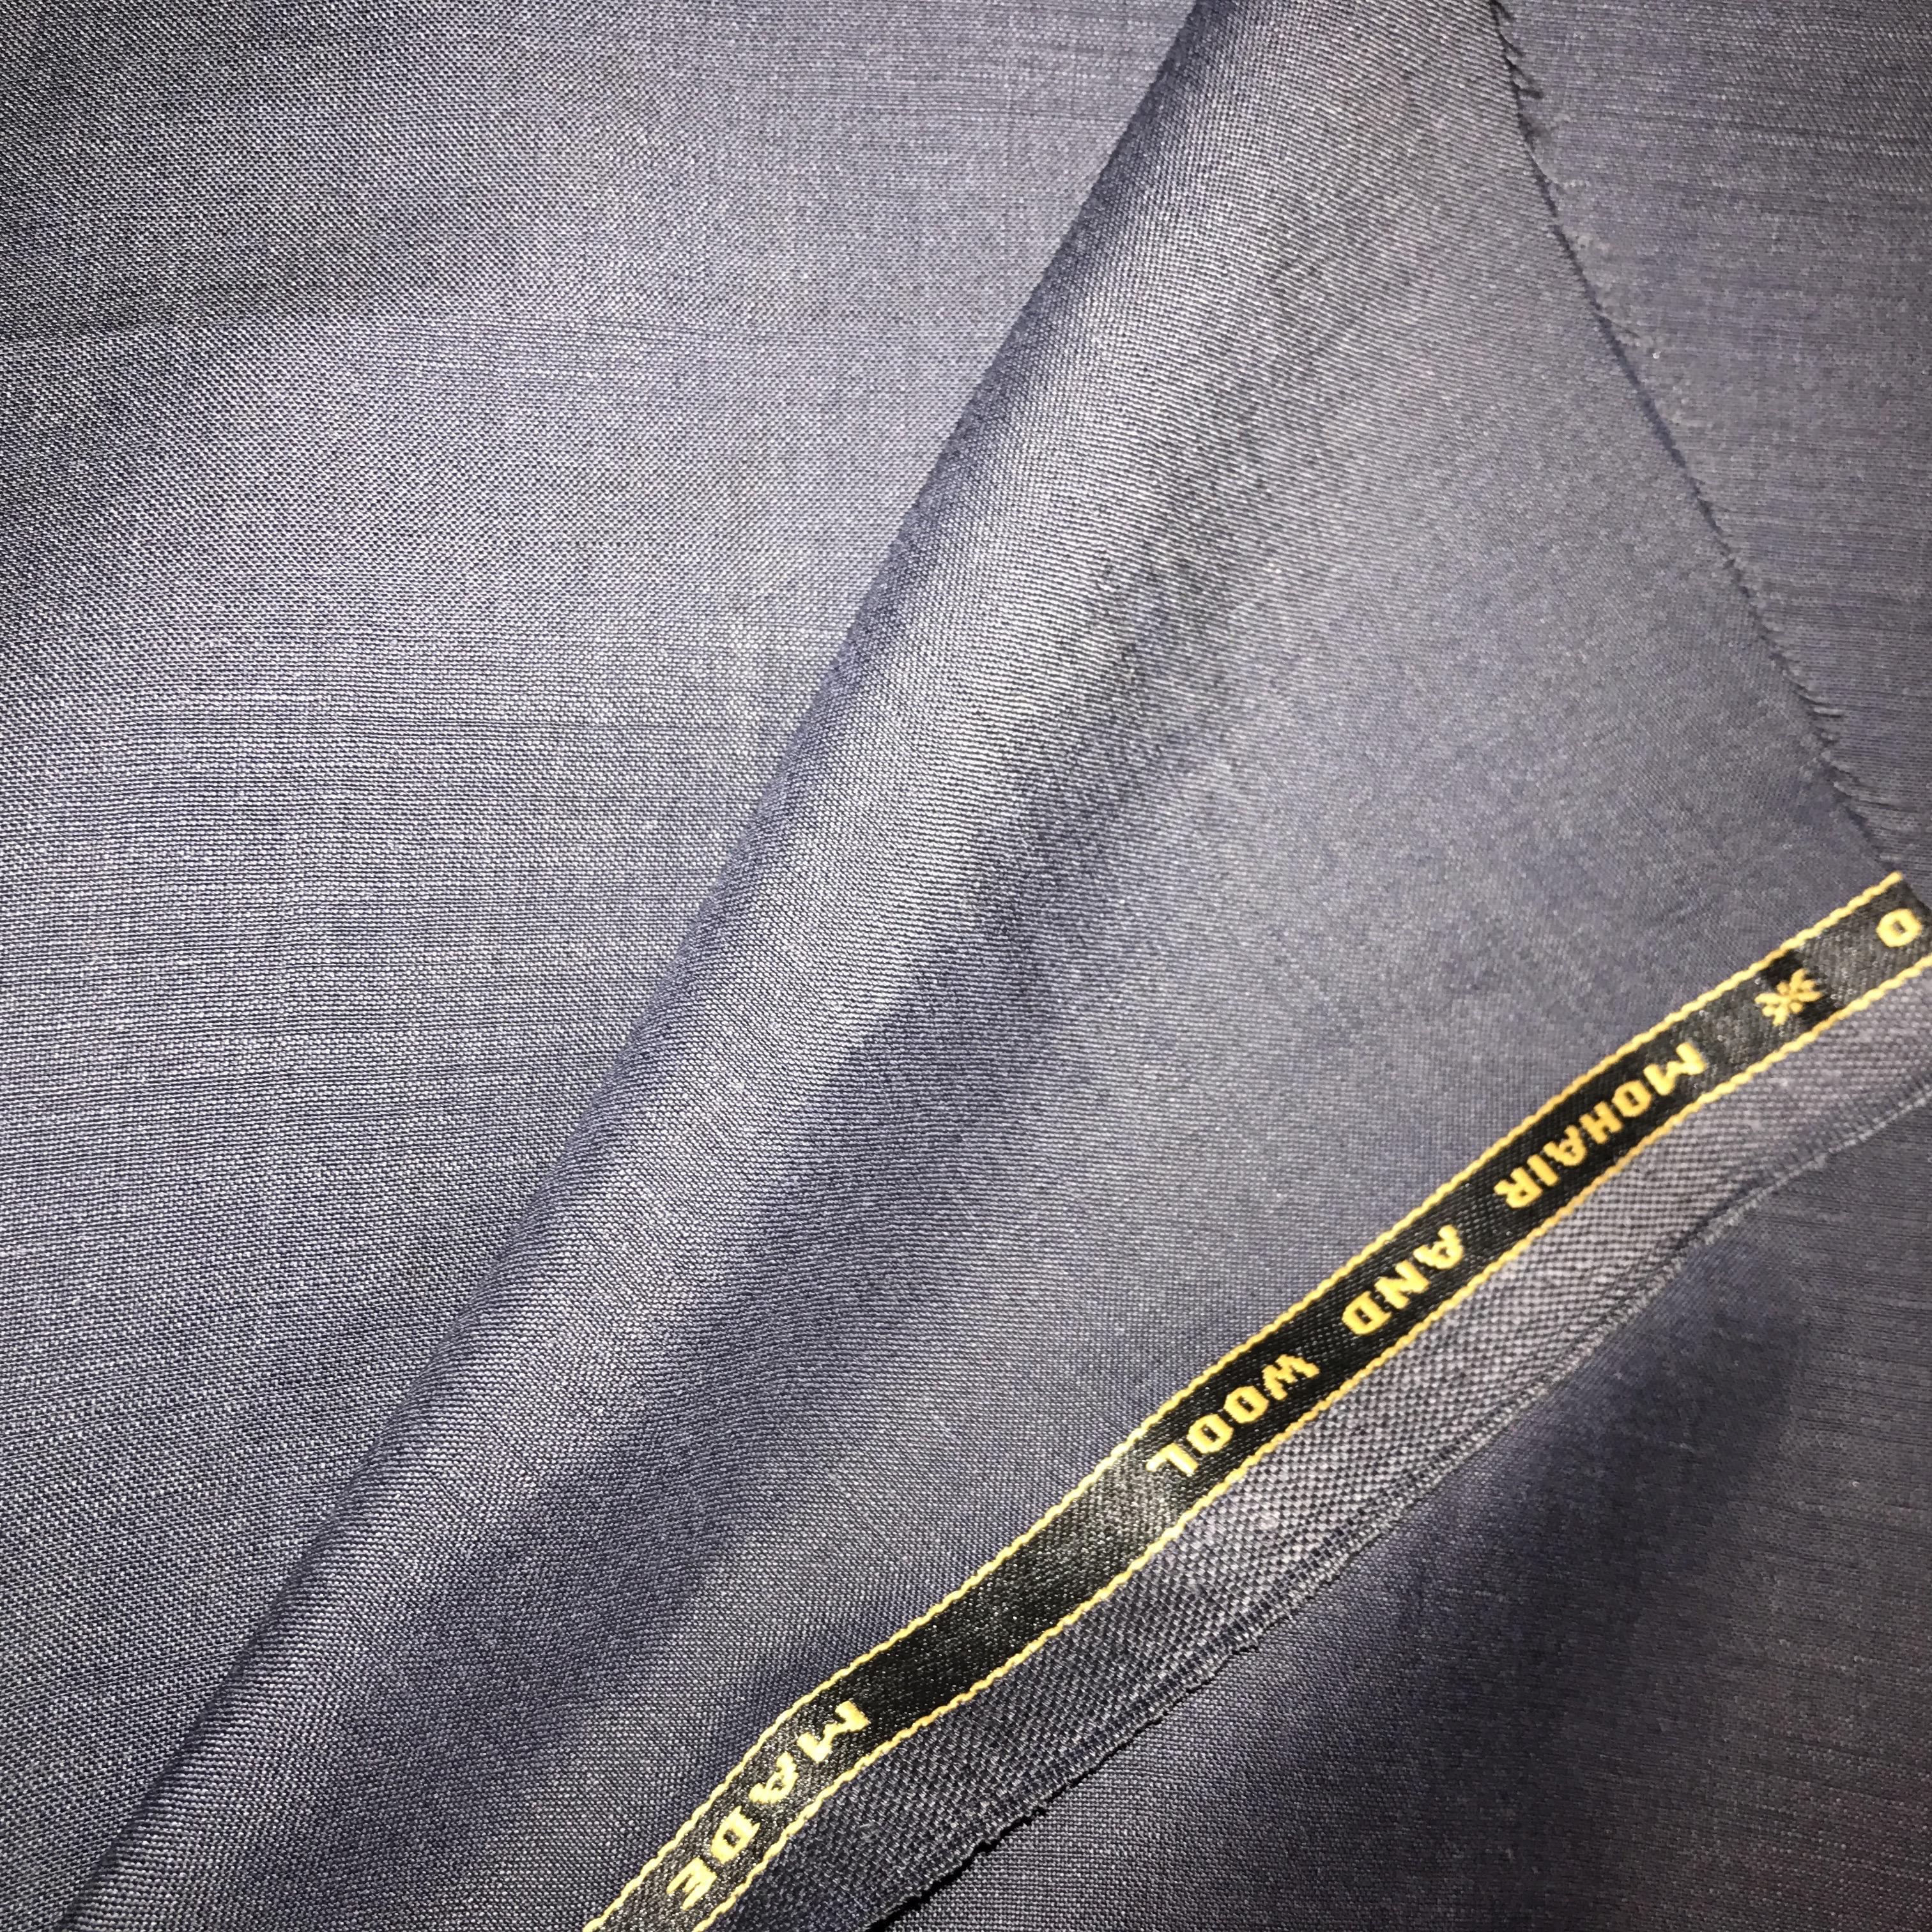 Paul Smith fabric from Simply Fabrics